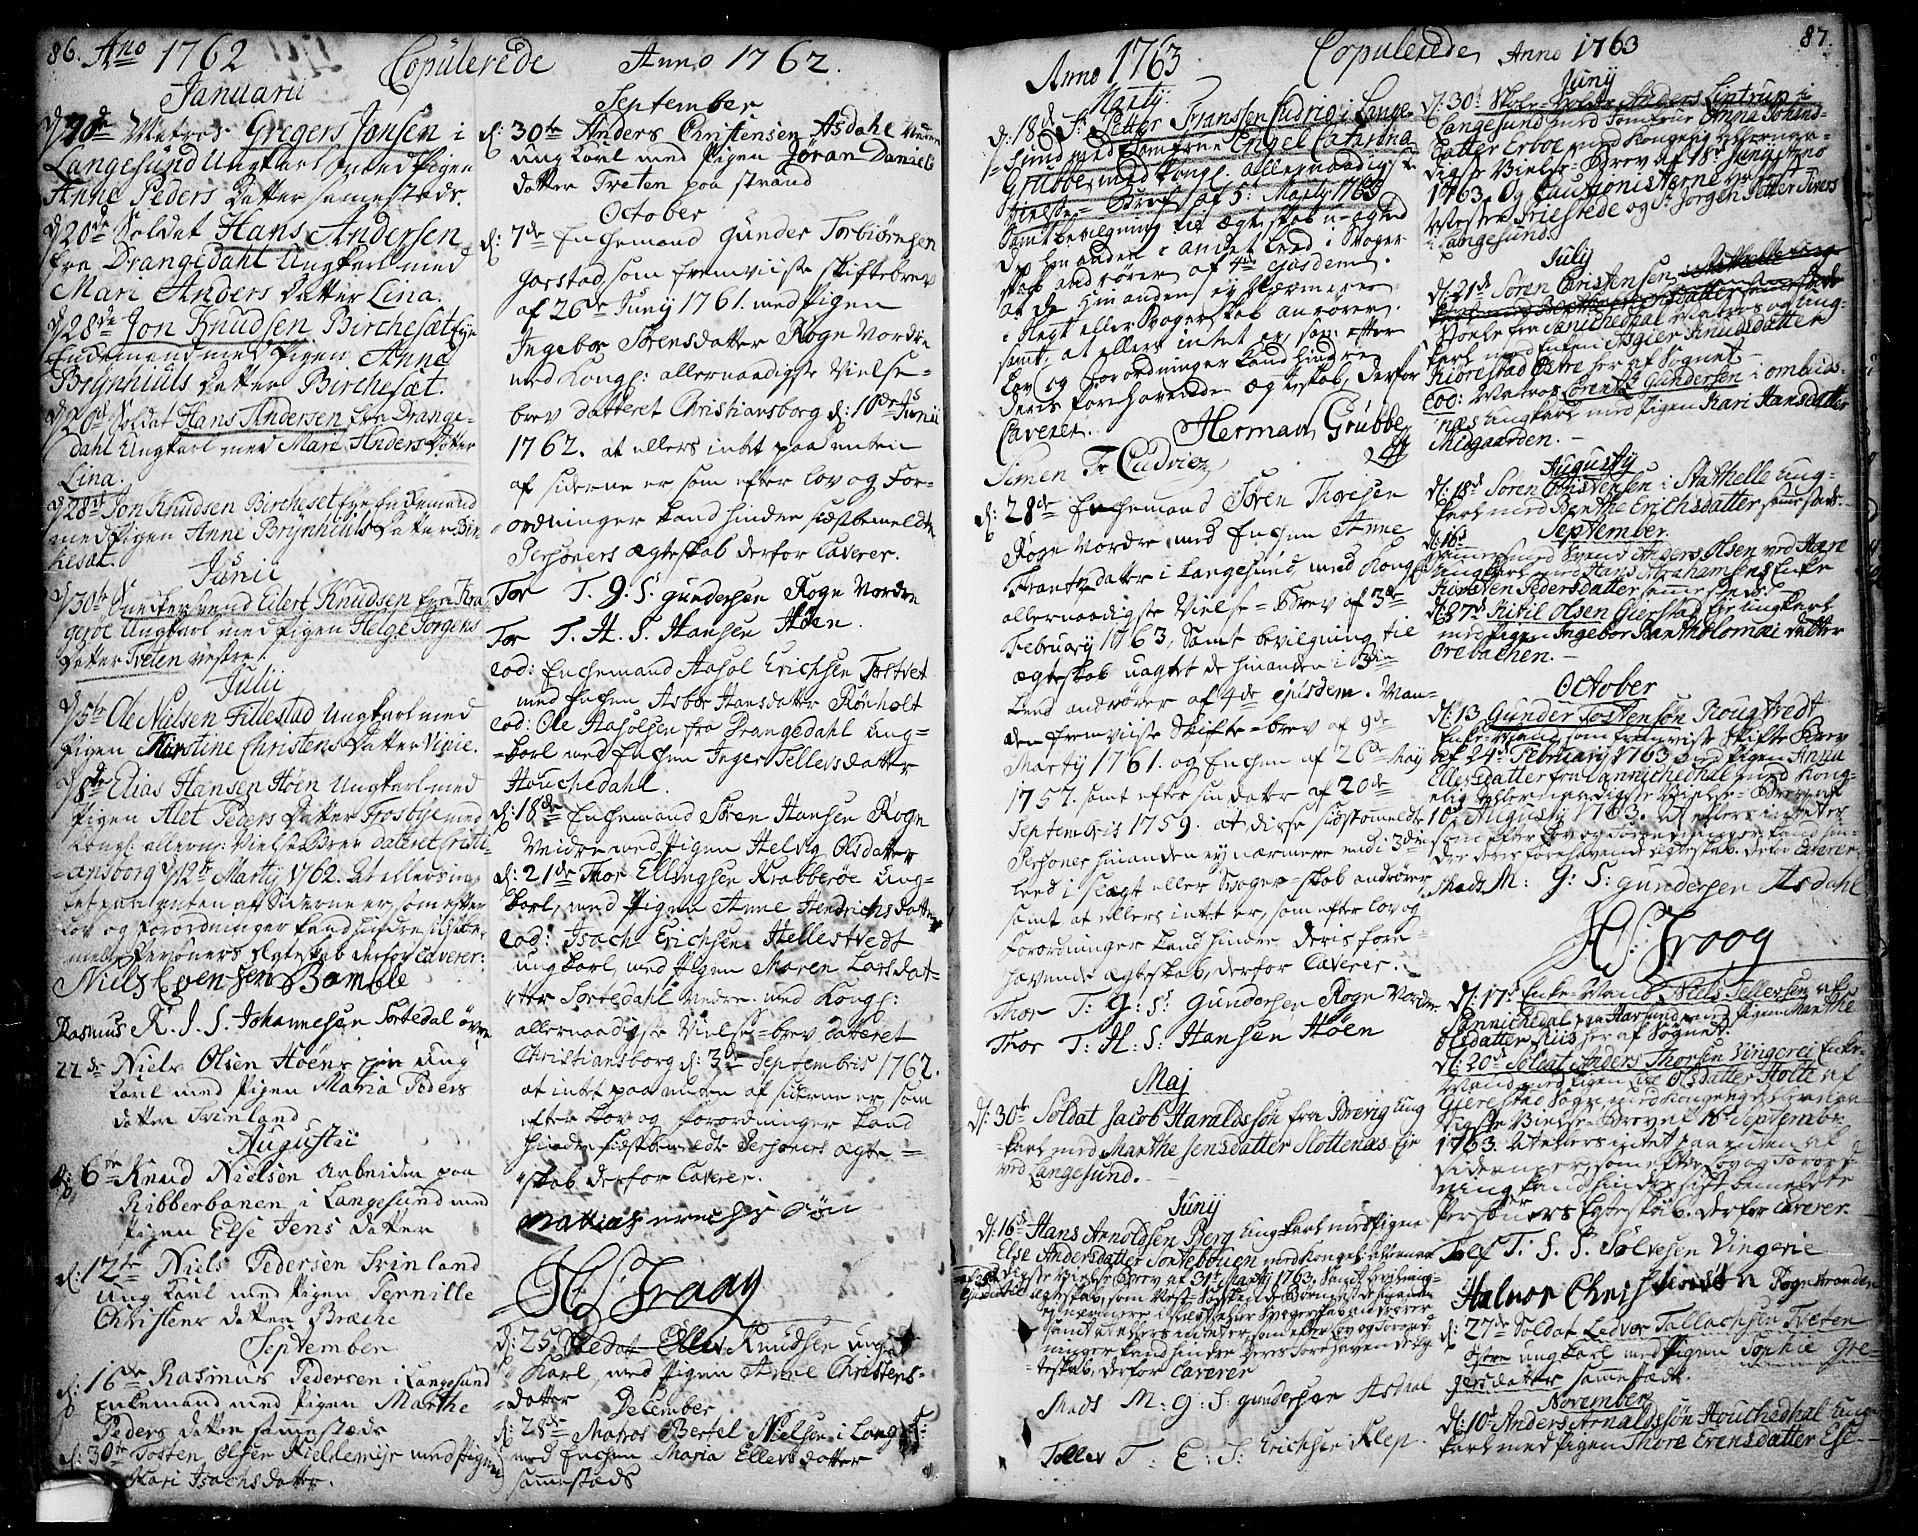 SAKO, Bamble kirkebøker, F/Fa/L0001: Ministerialbok nr. I 1, 1702-1774, s. 86-87